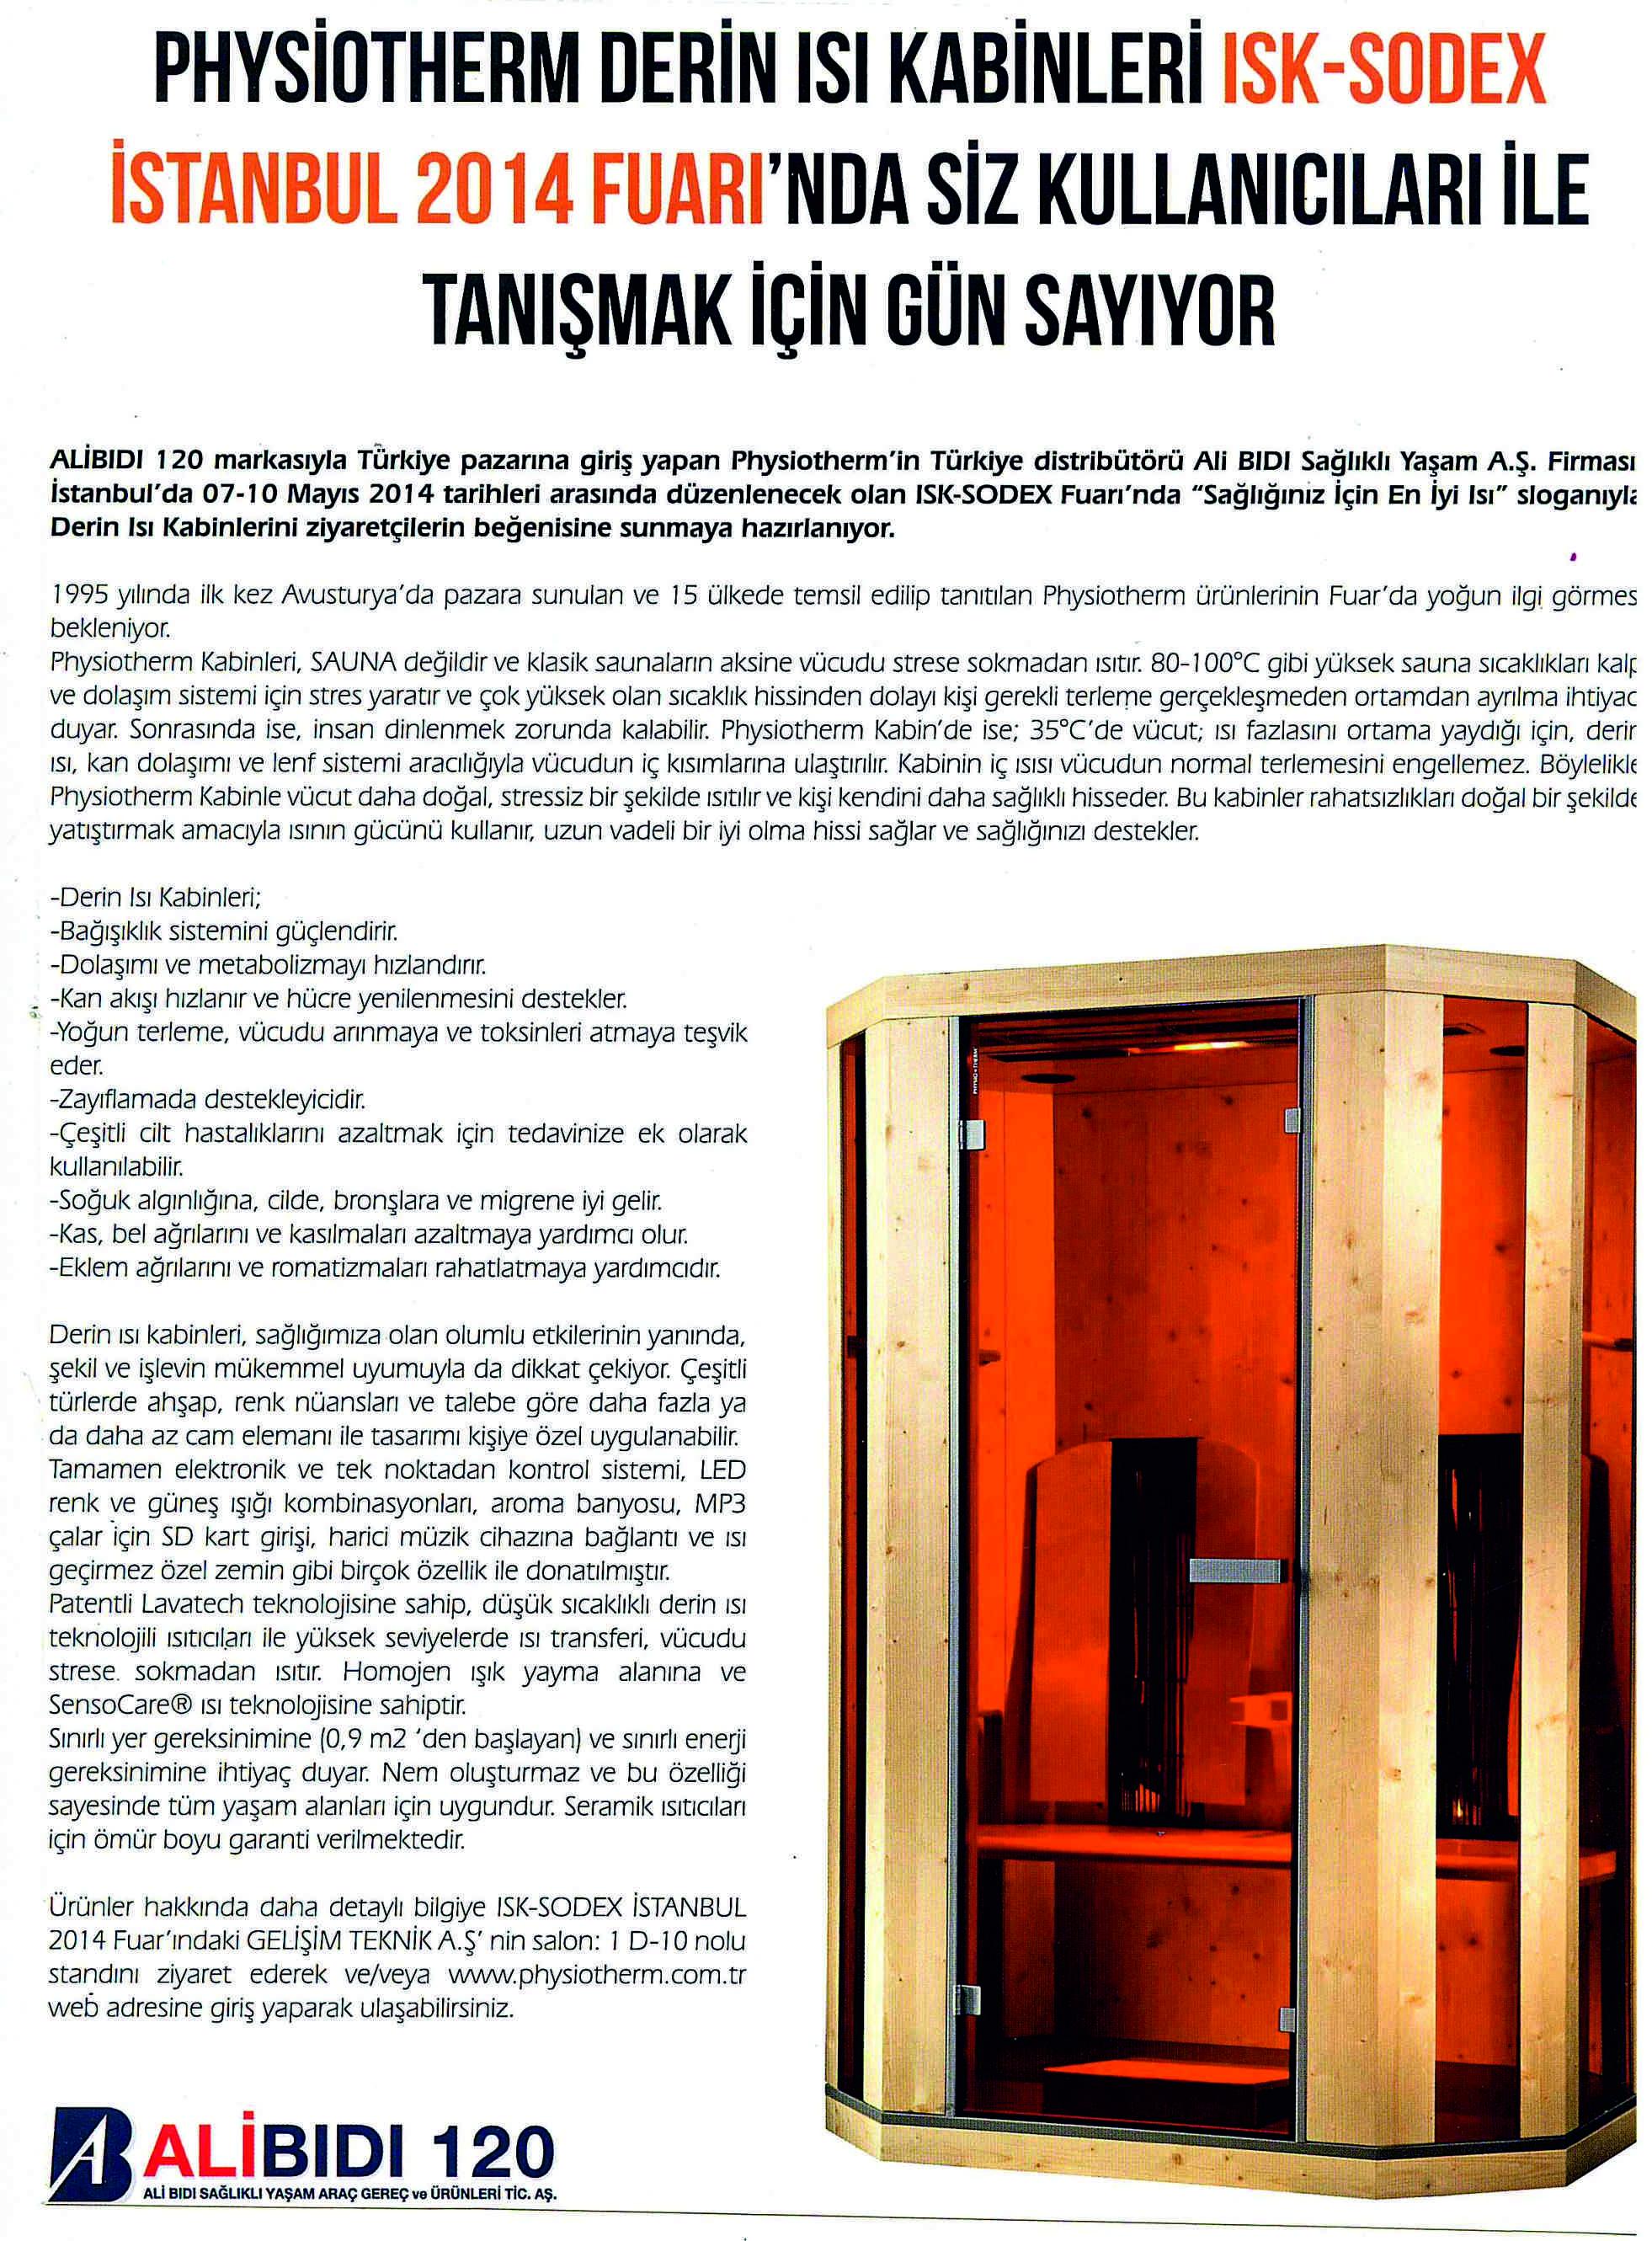 insaat haber nisan-mayis 2014-45.sayi